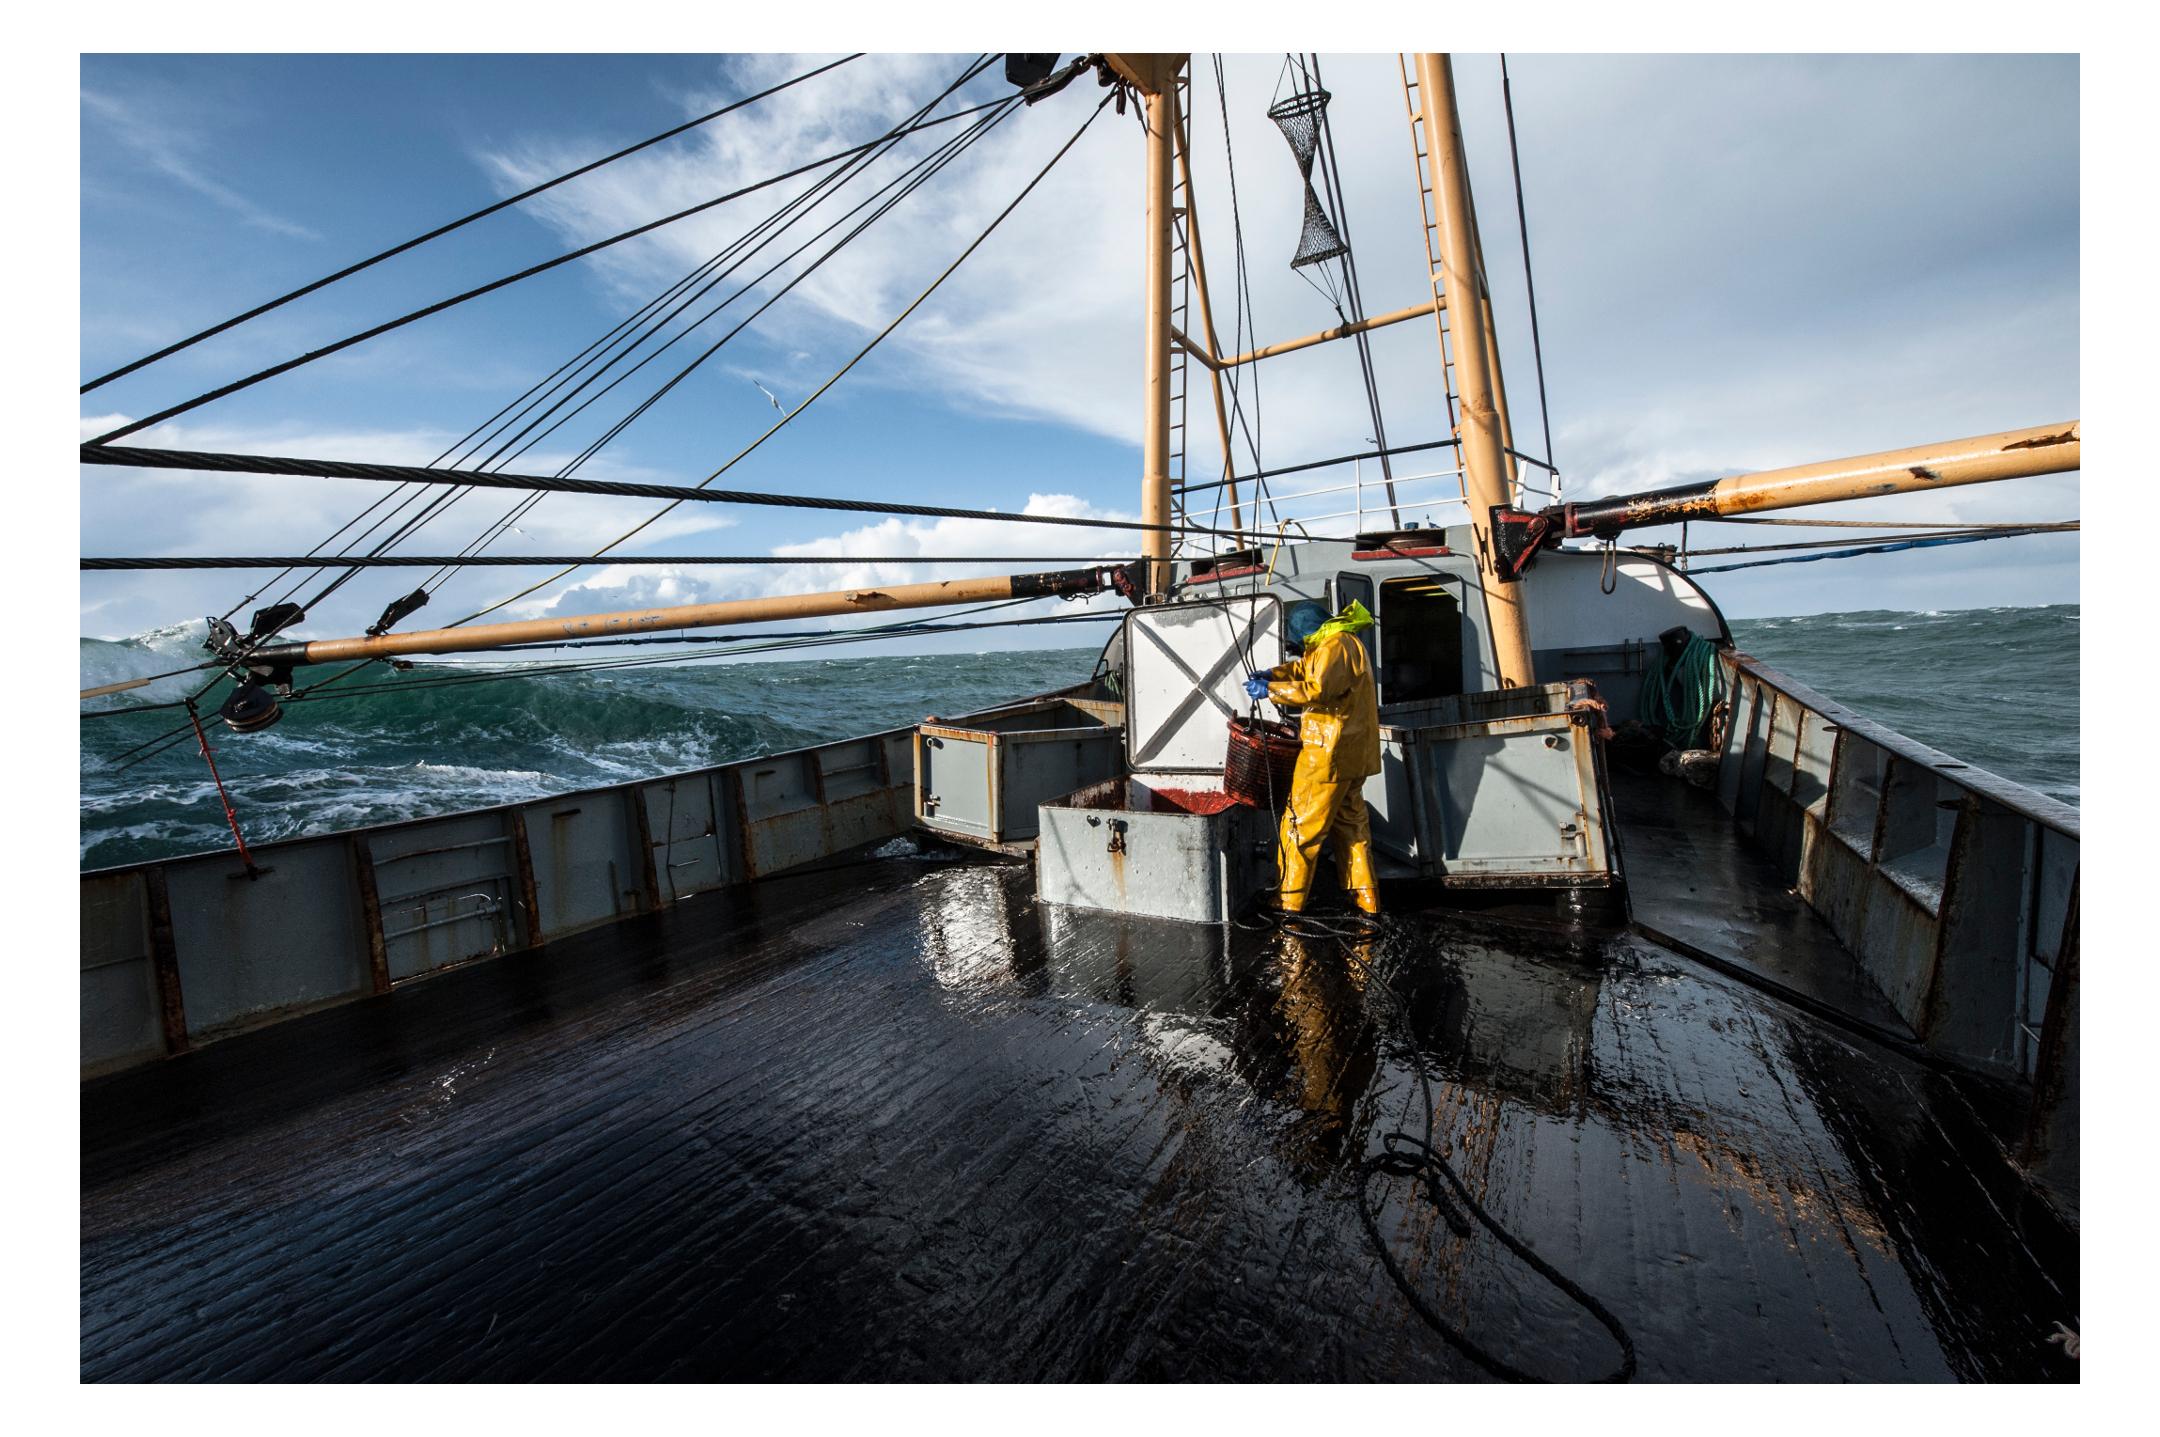 waterdance_beam_trawlers_7.jpg